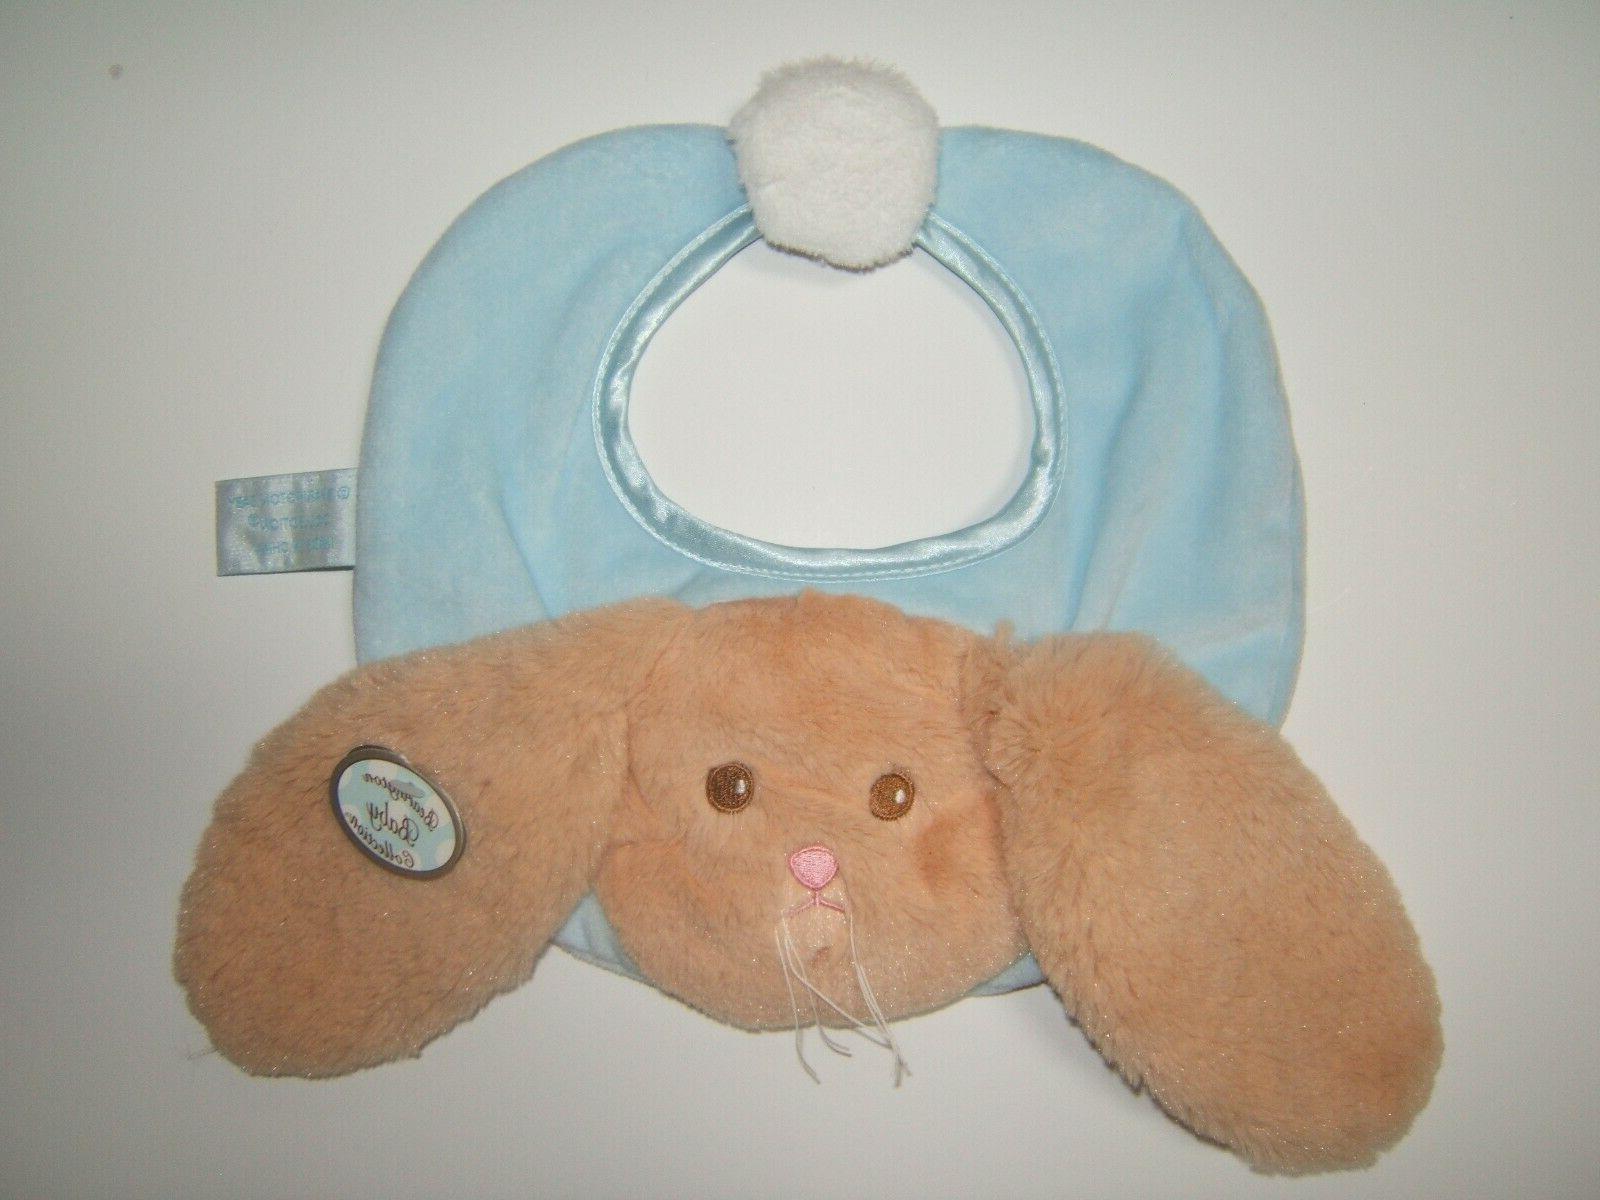 Bearington Collection Bunny Tail Soft Bib